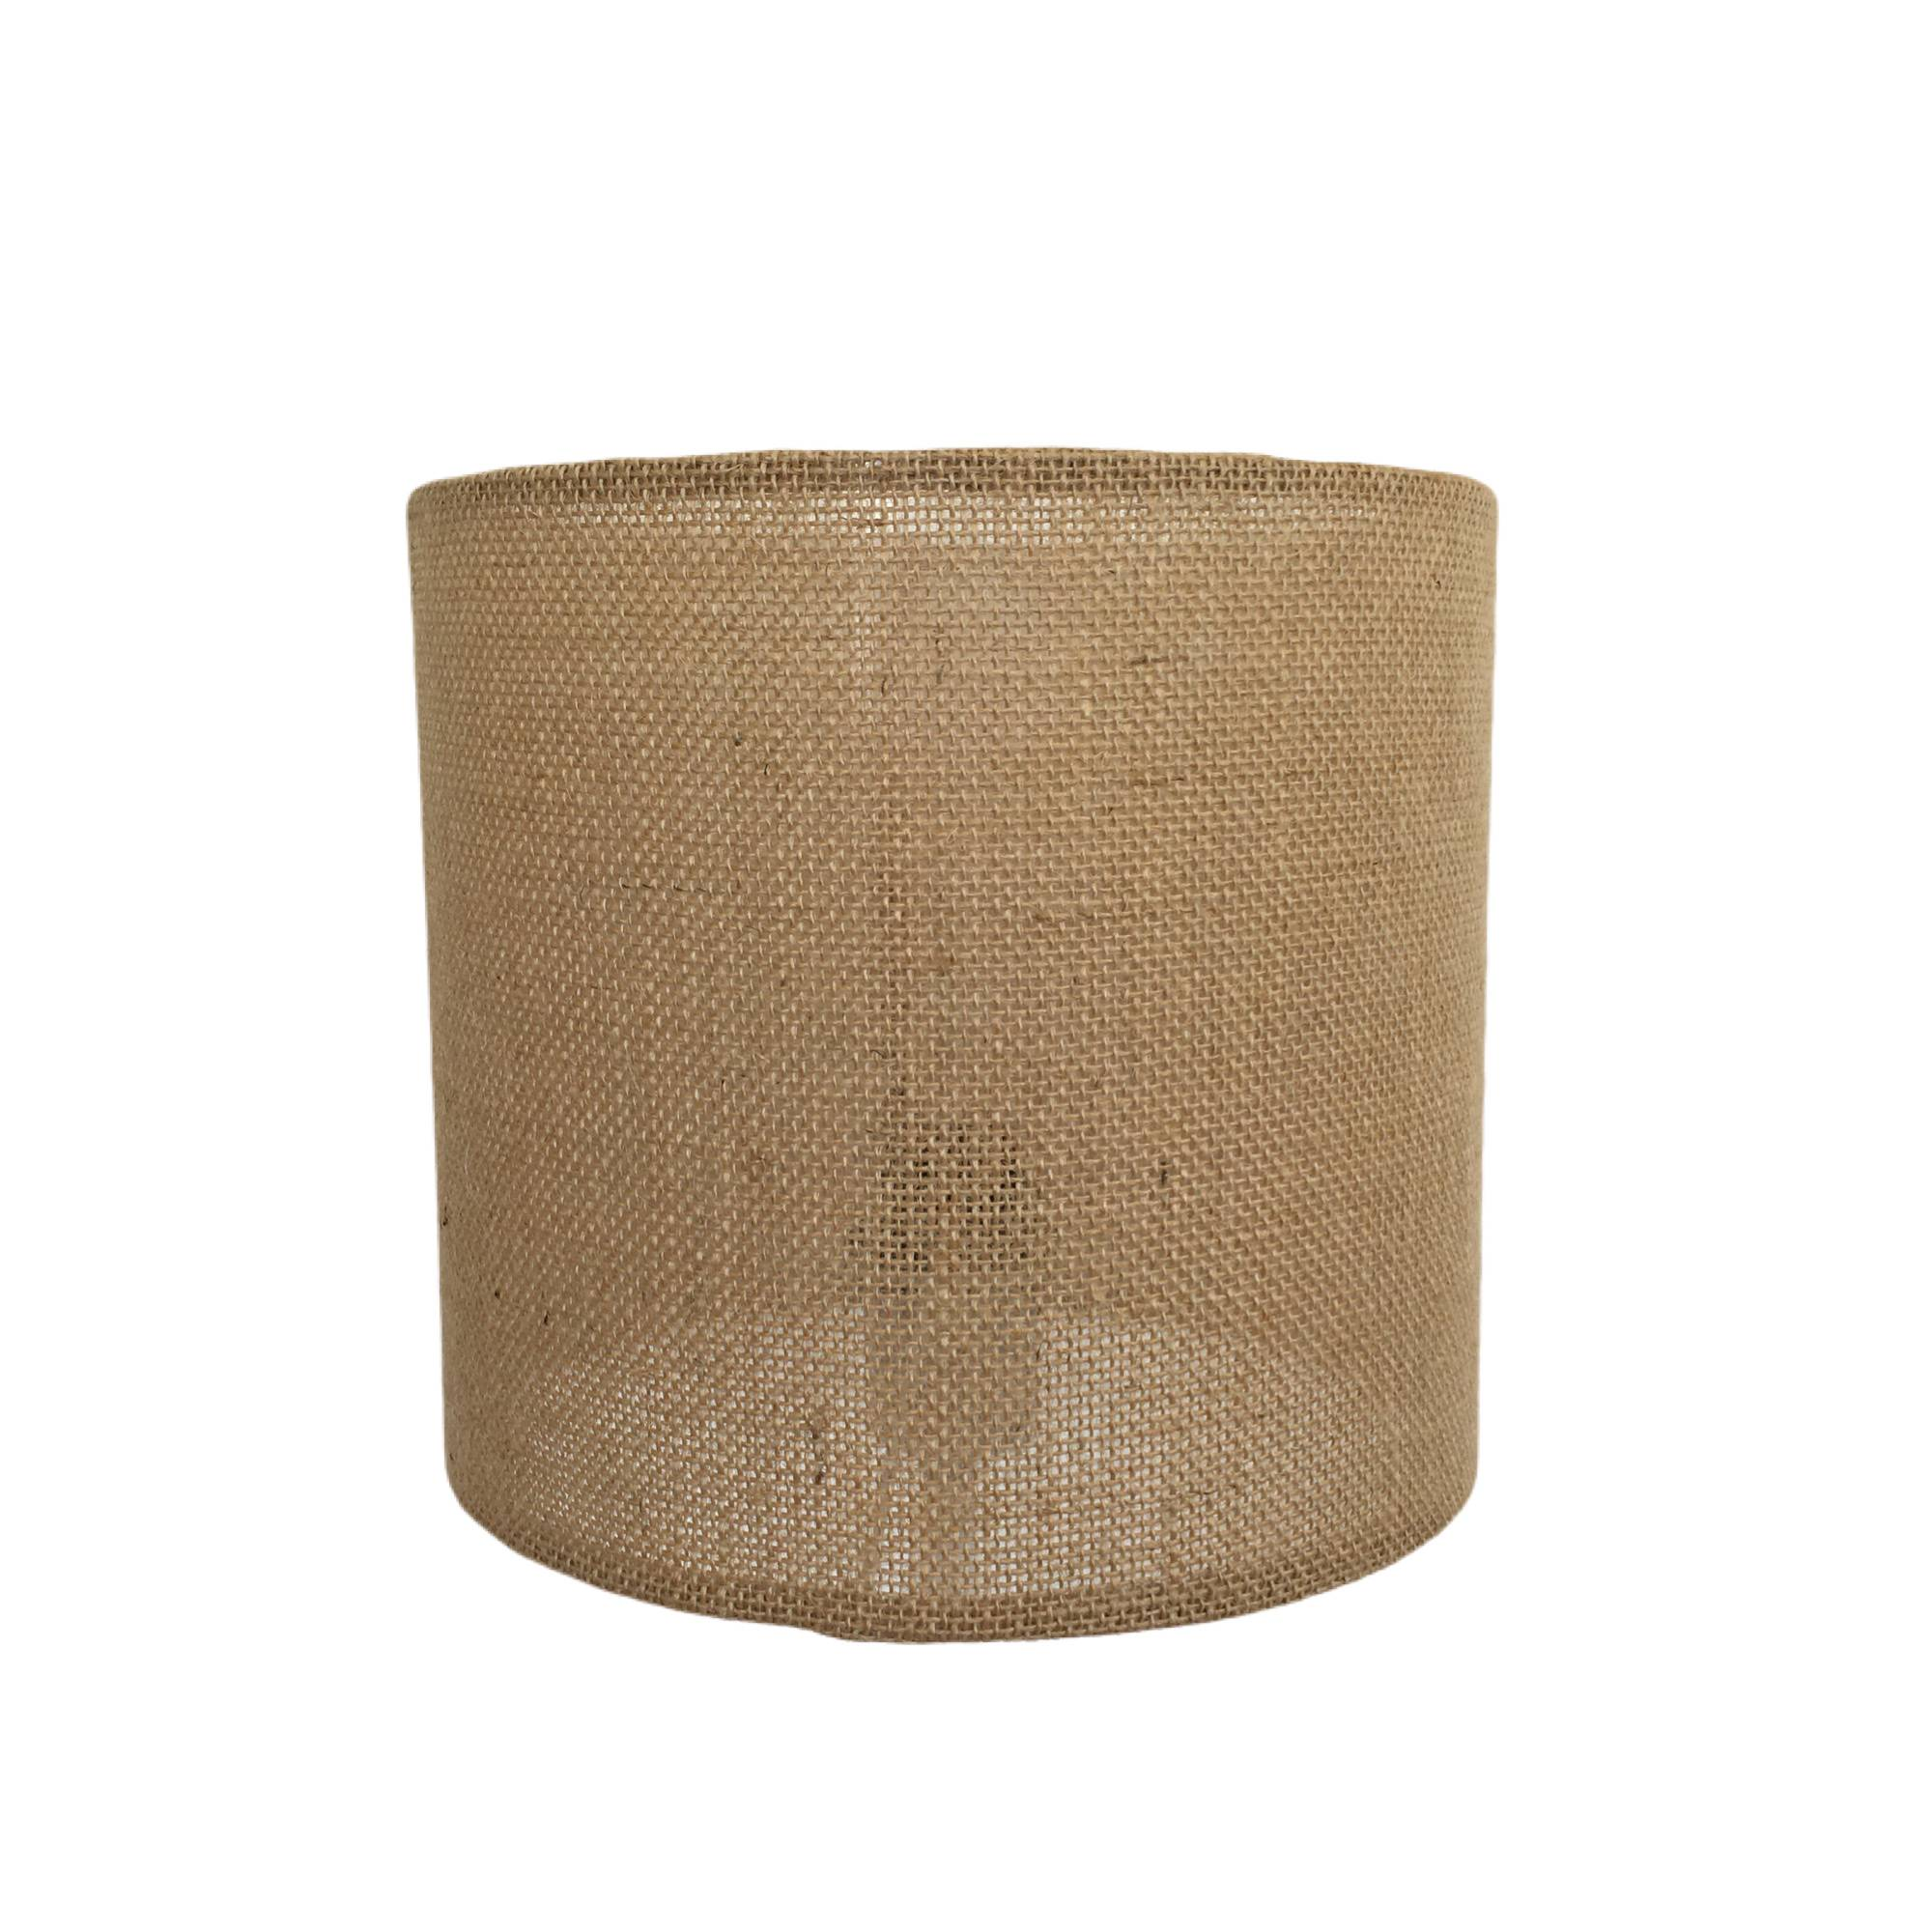 Belamp Suspension toile de jute diamètre 50 cm